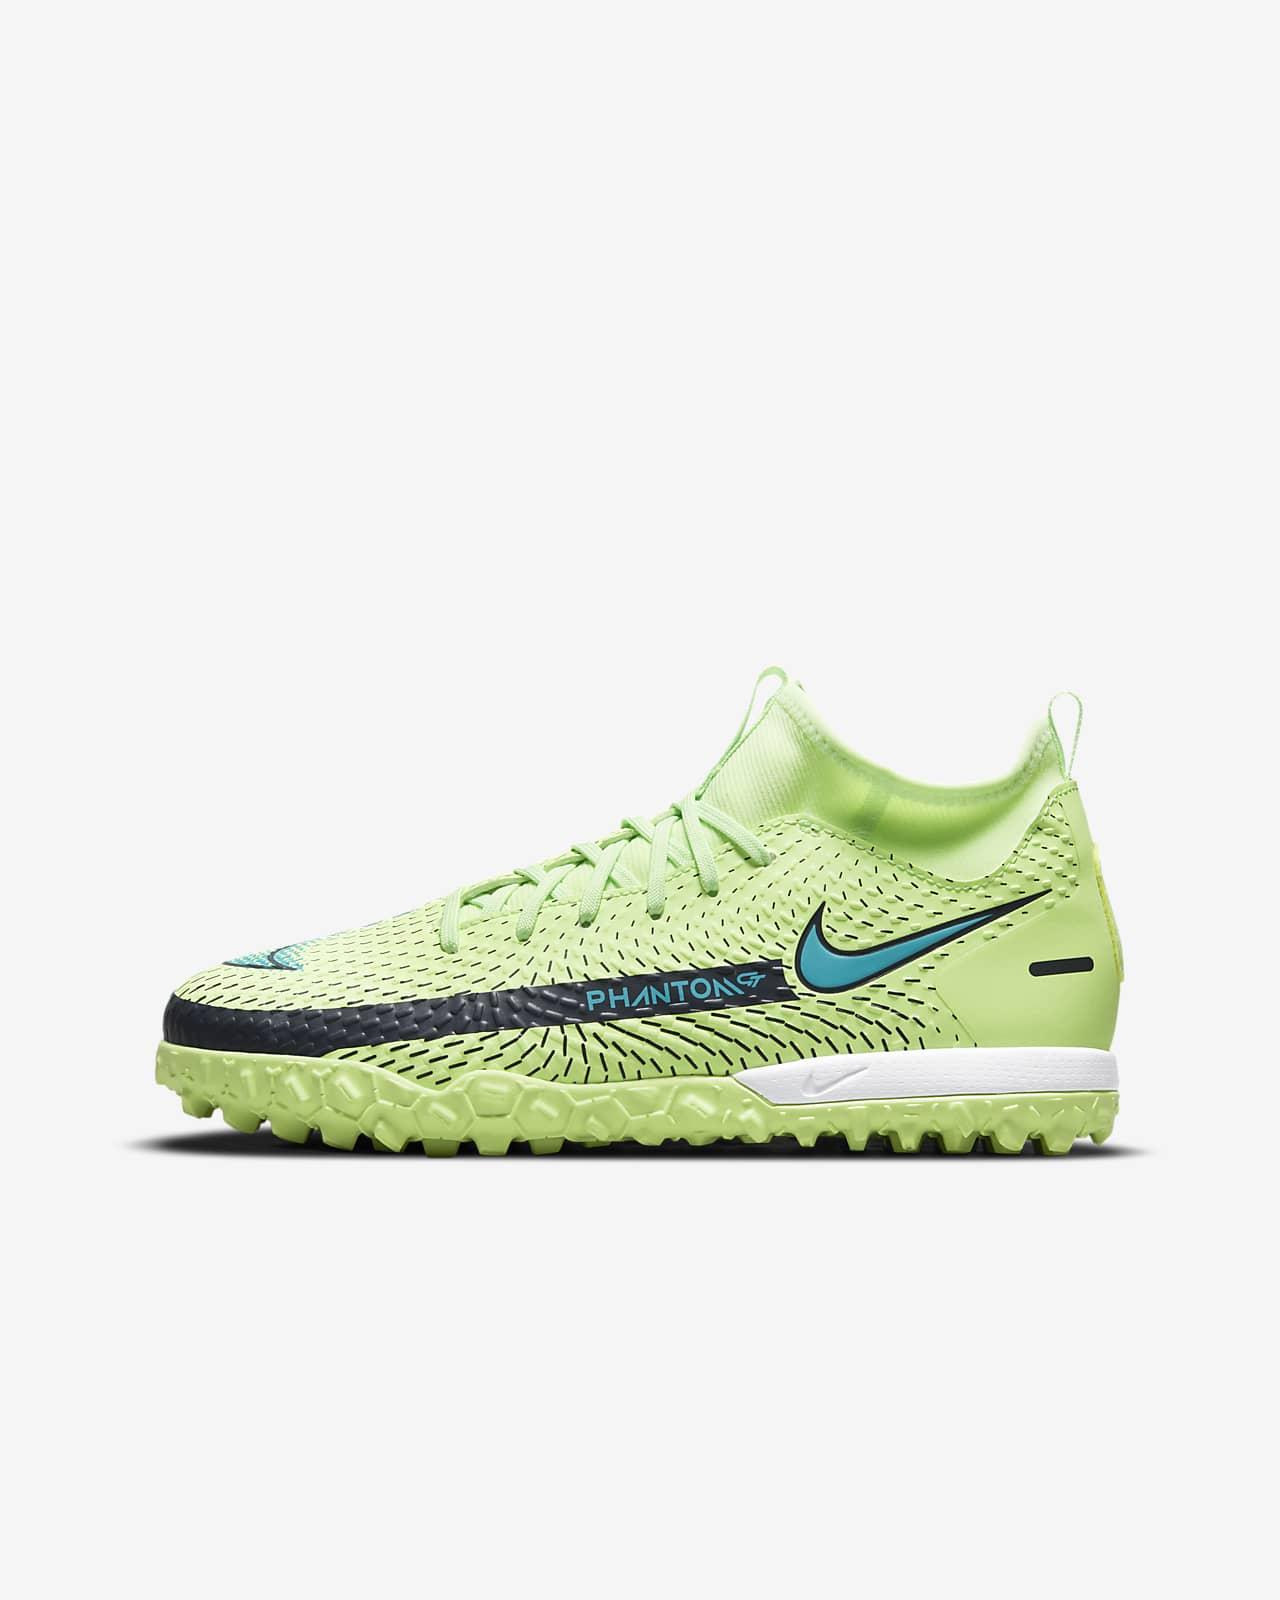 Scarpa da calcio per erba artificiale/sintetica Nike Jr. Phantom GT Academy Dynamic Fit TF - Bambini/Ragazzi